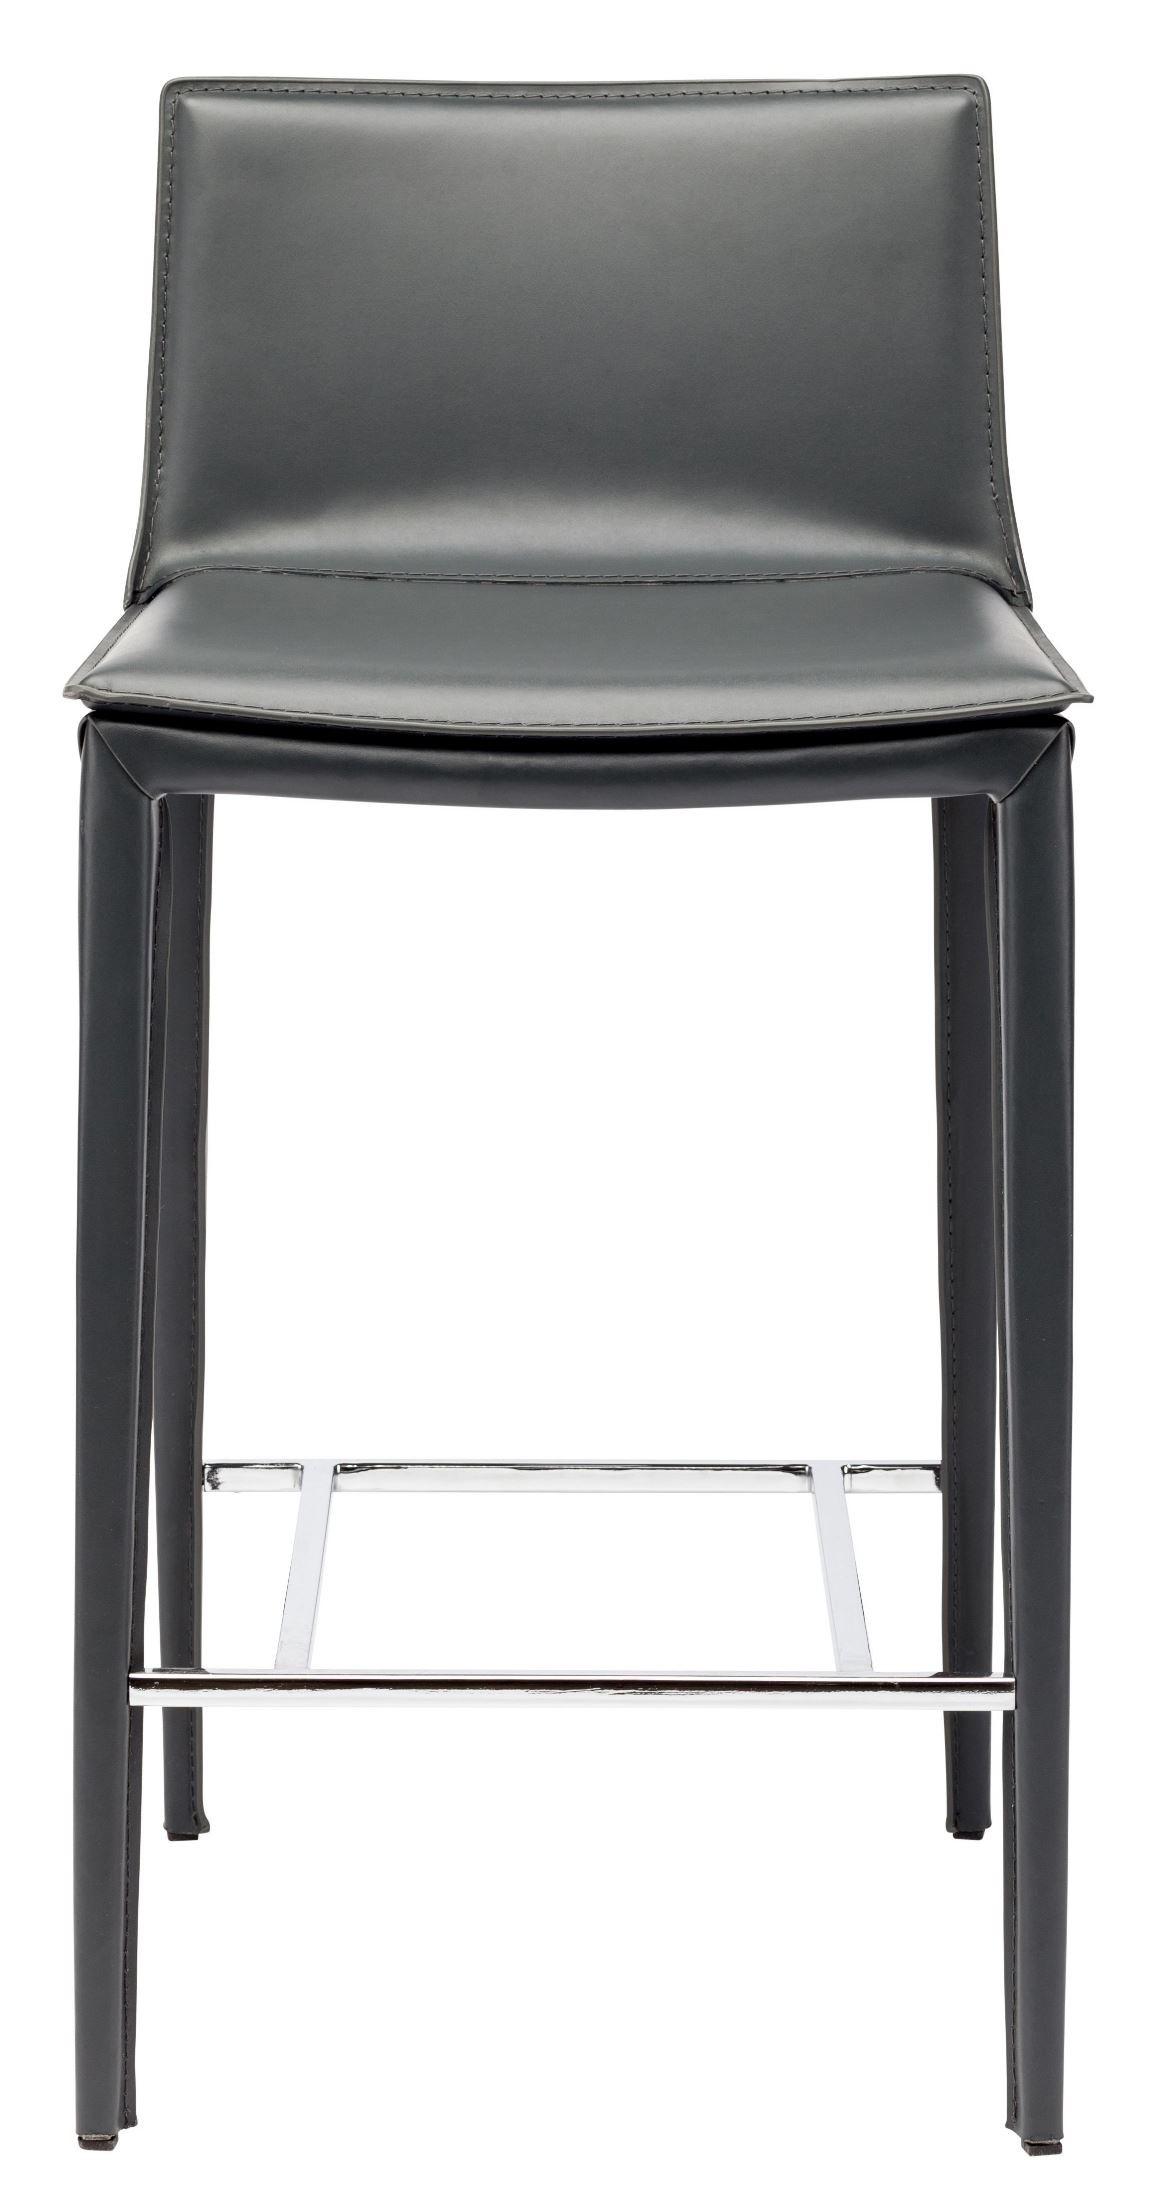 Palma Grey Leather Counter Stool Hgnd110 Nuevo